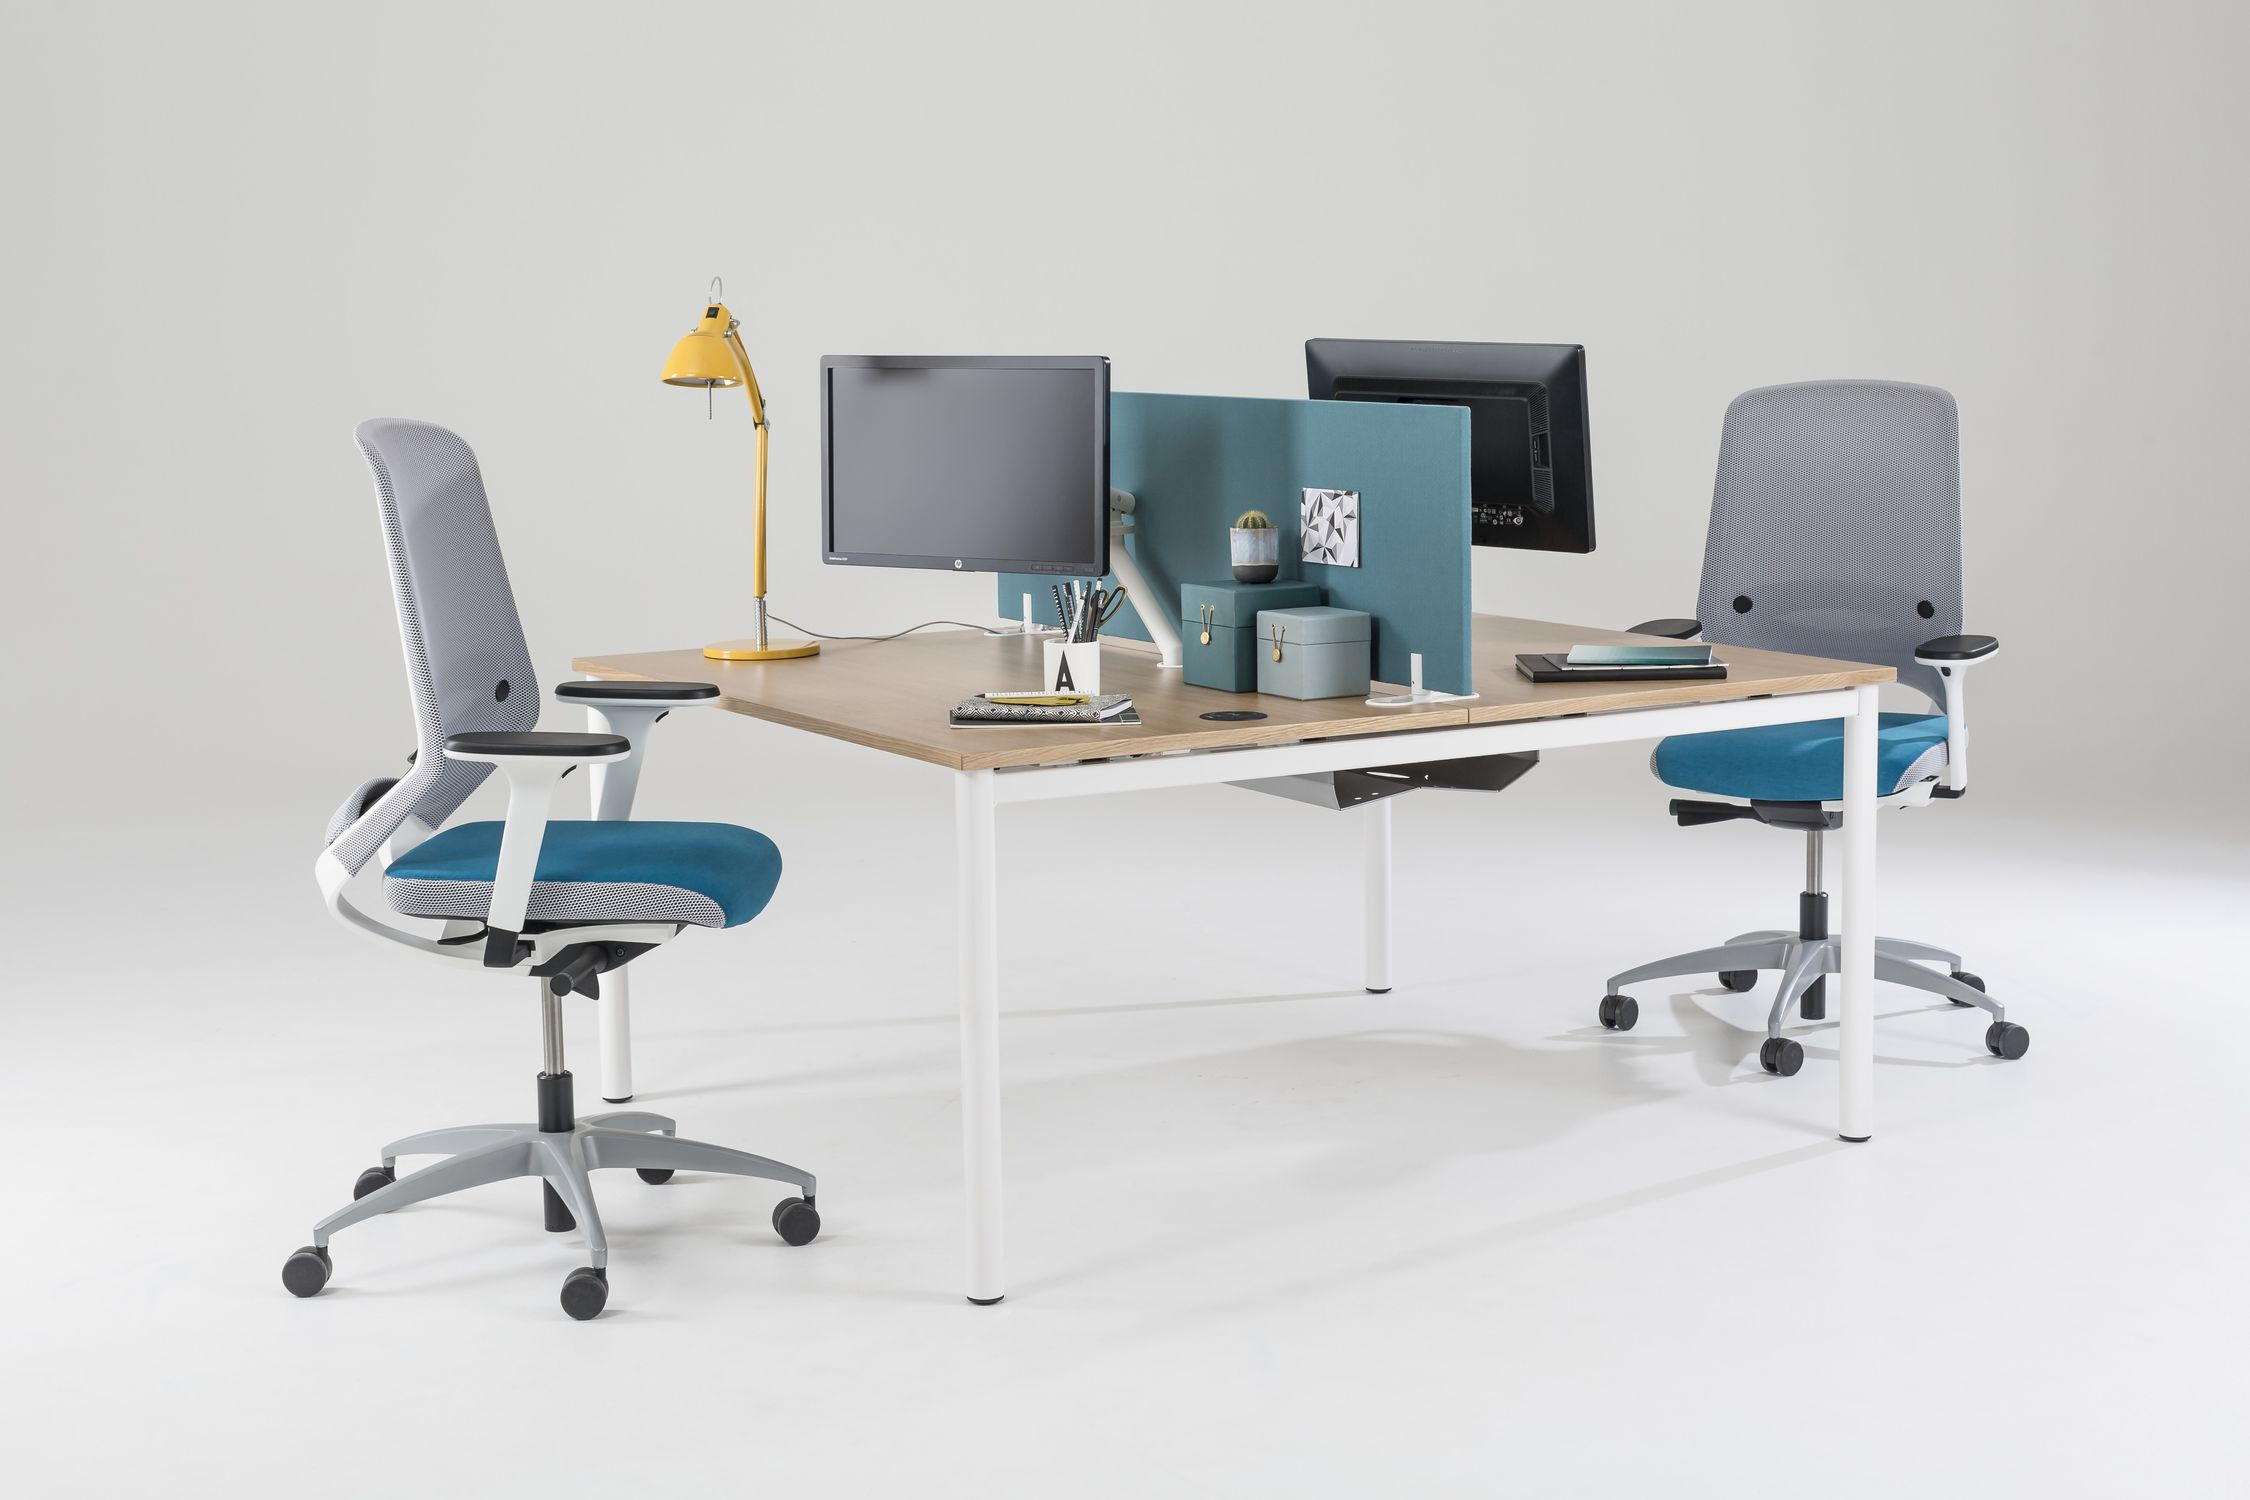 Bureaux kinnarps chaise de bureau kinnarps thegoldenpalm info